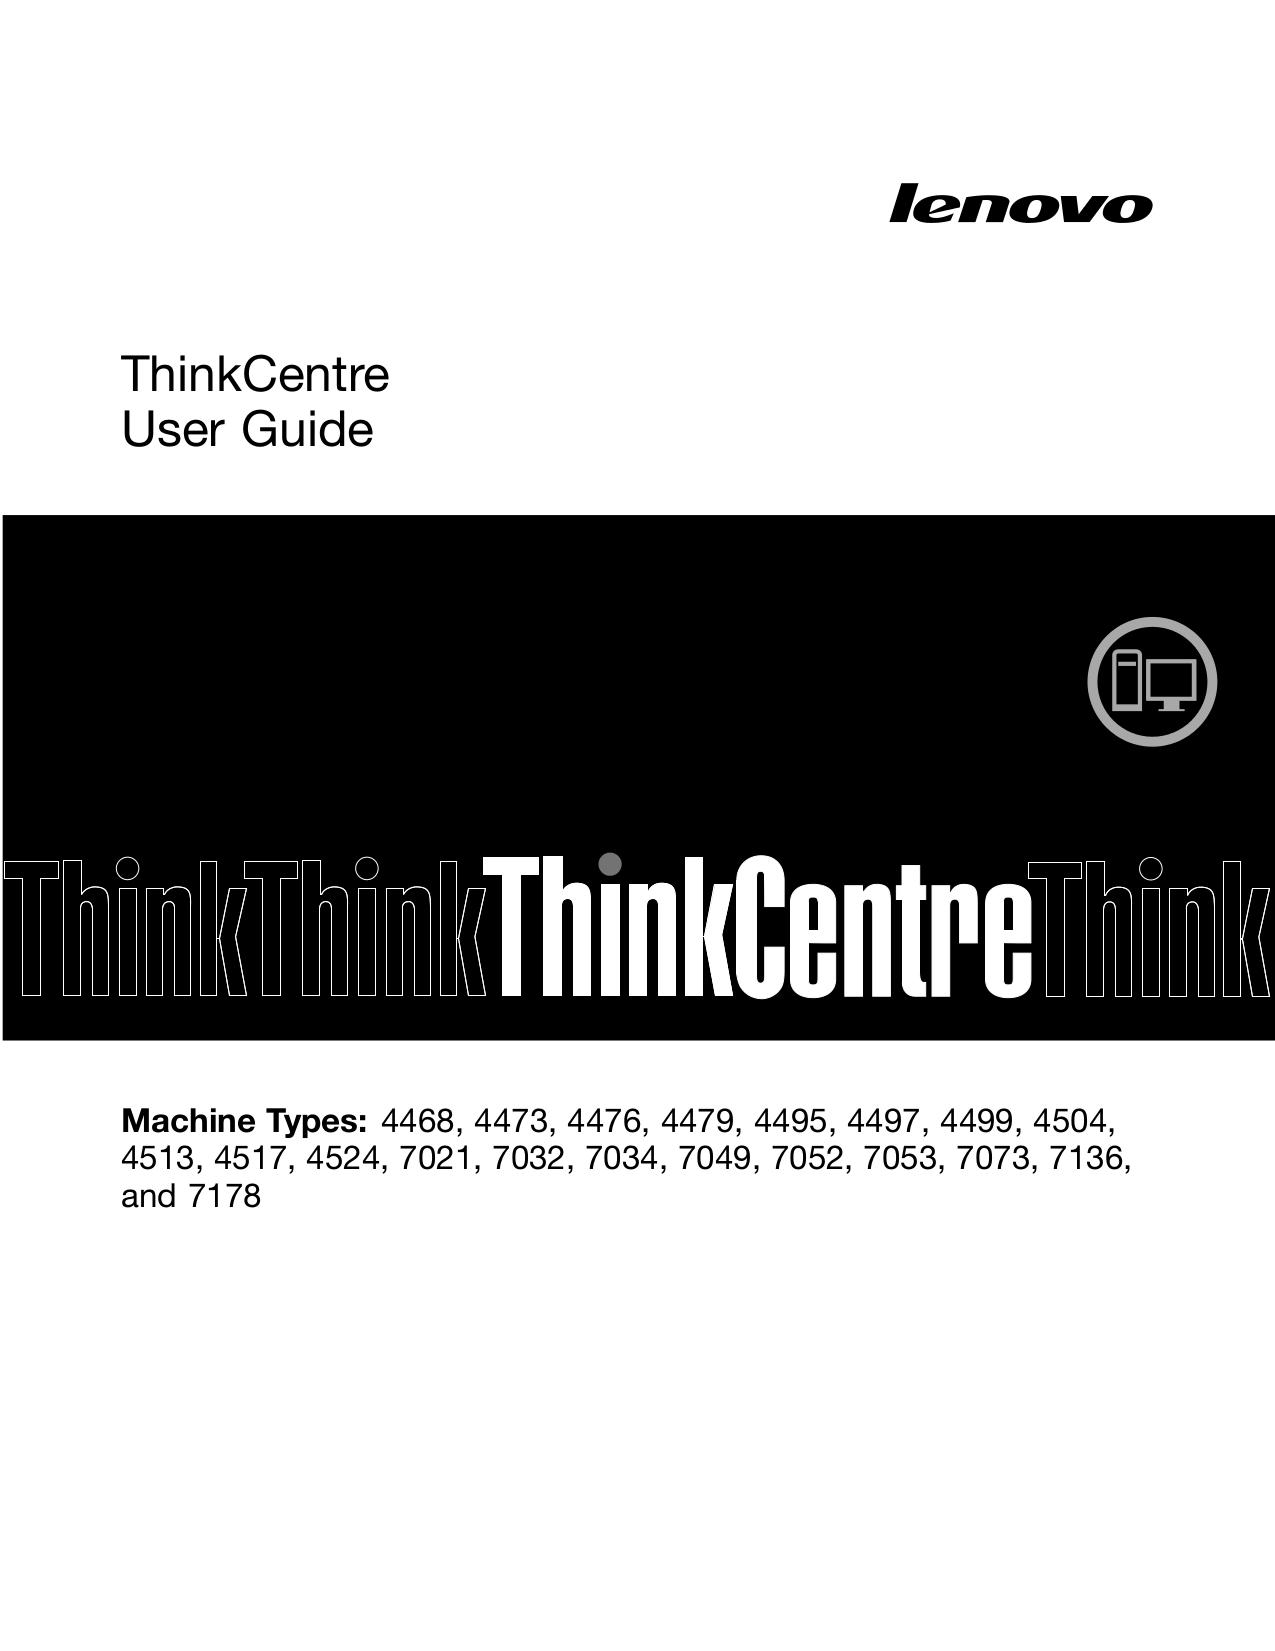 pdf for Lenovo Desktop ThinkCentre M91p 7052 manual